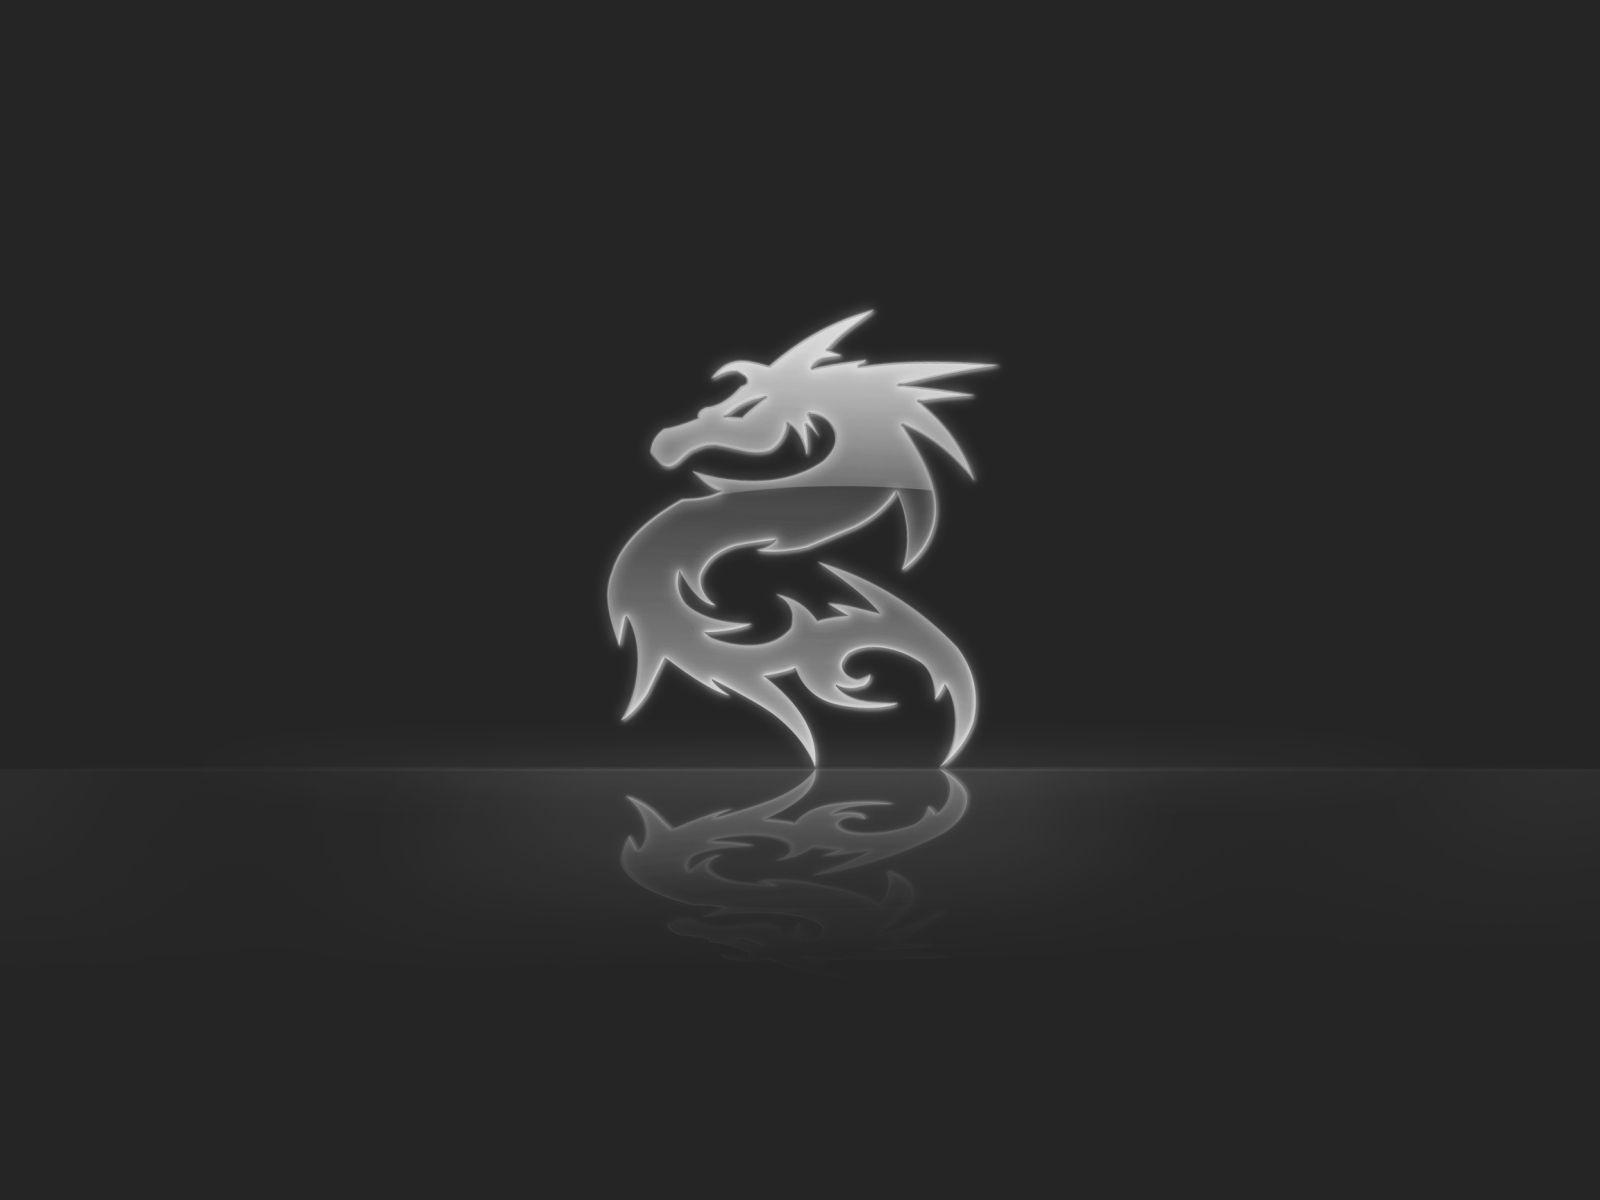 Dragon wallpaper xxxx erotic video